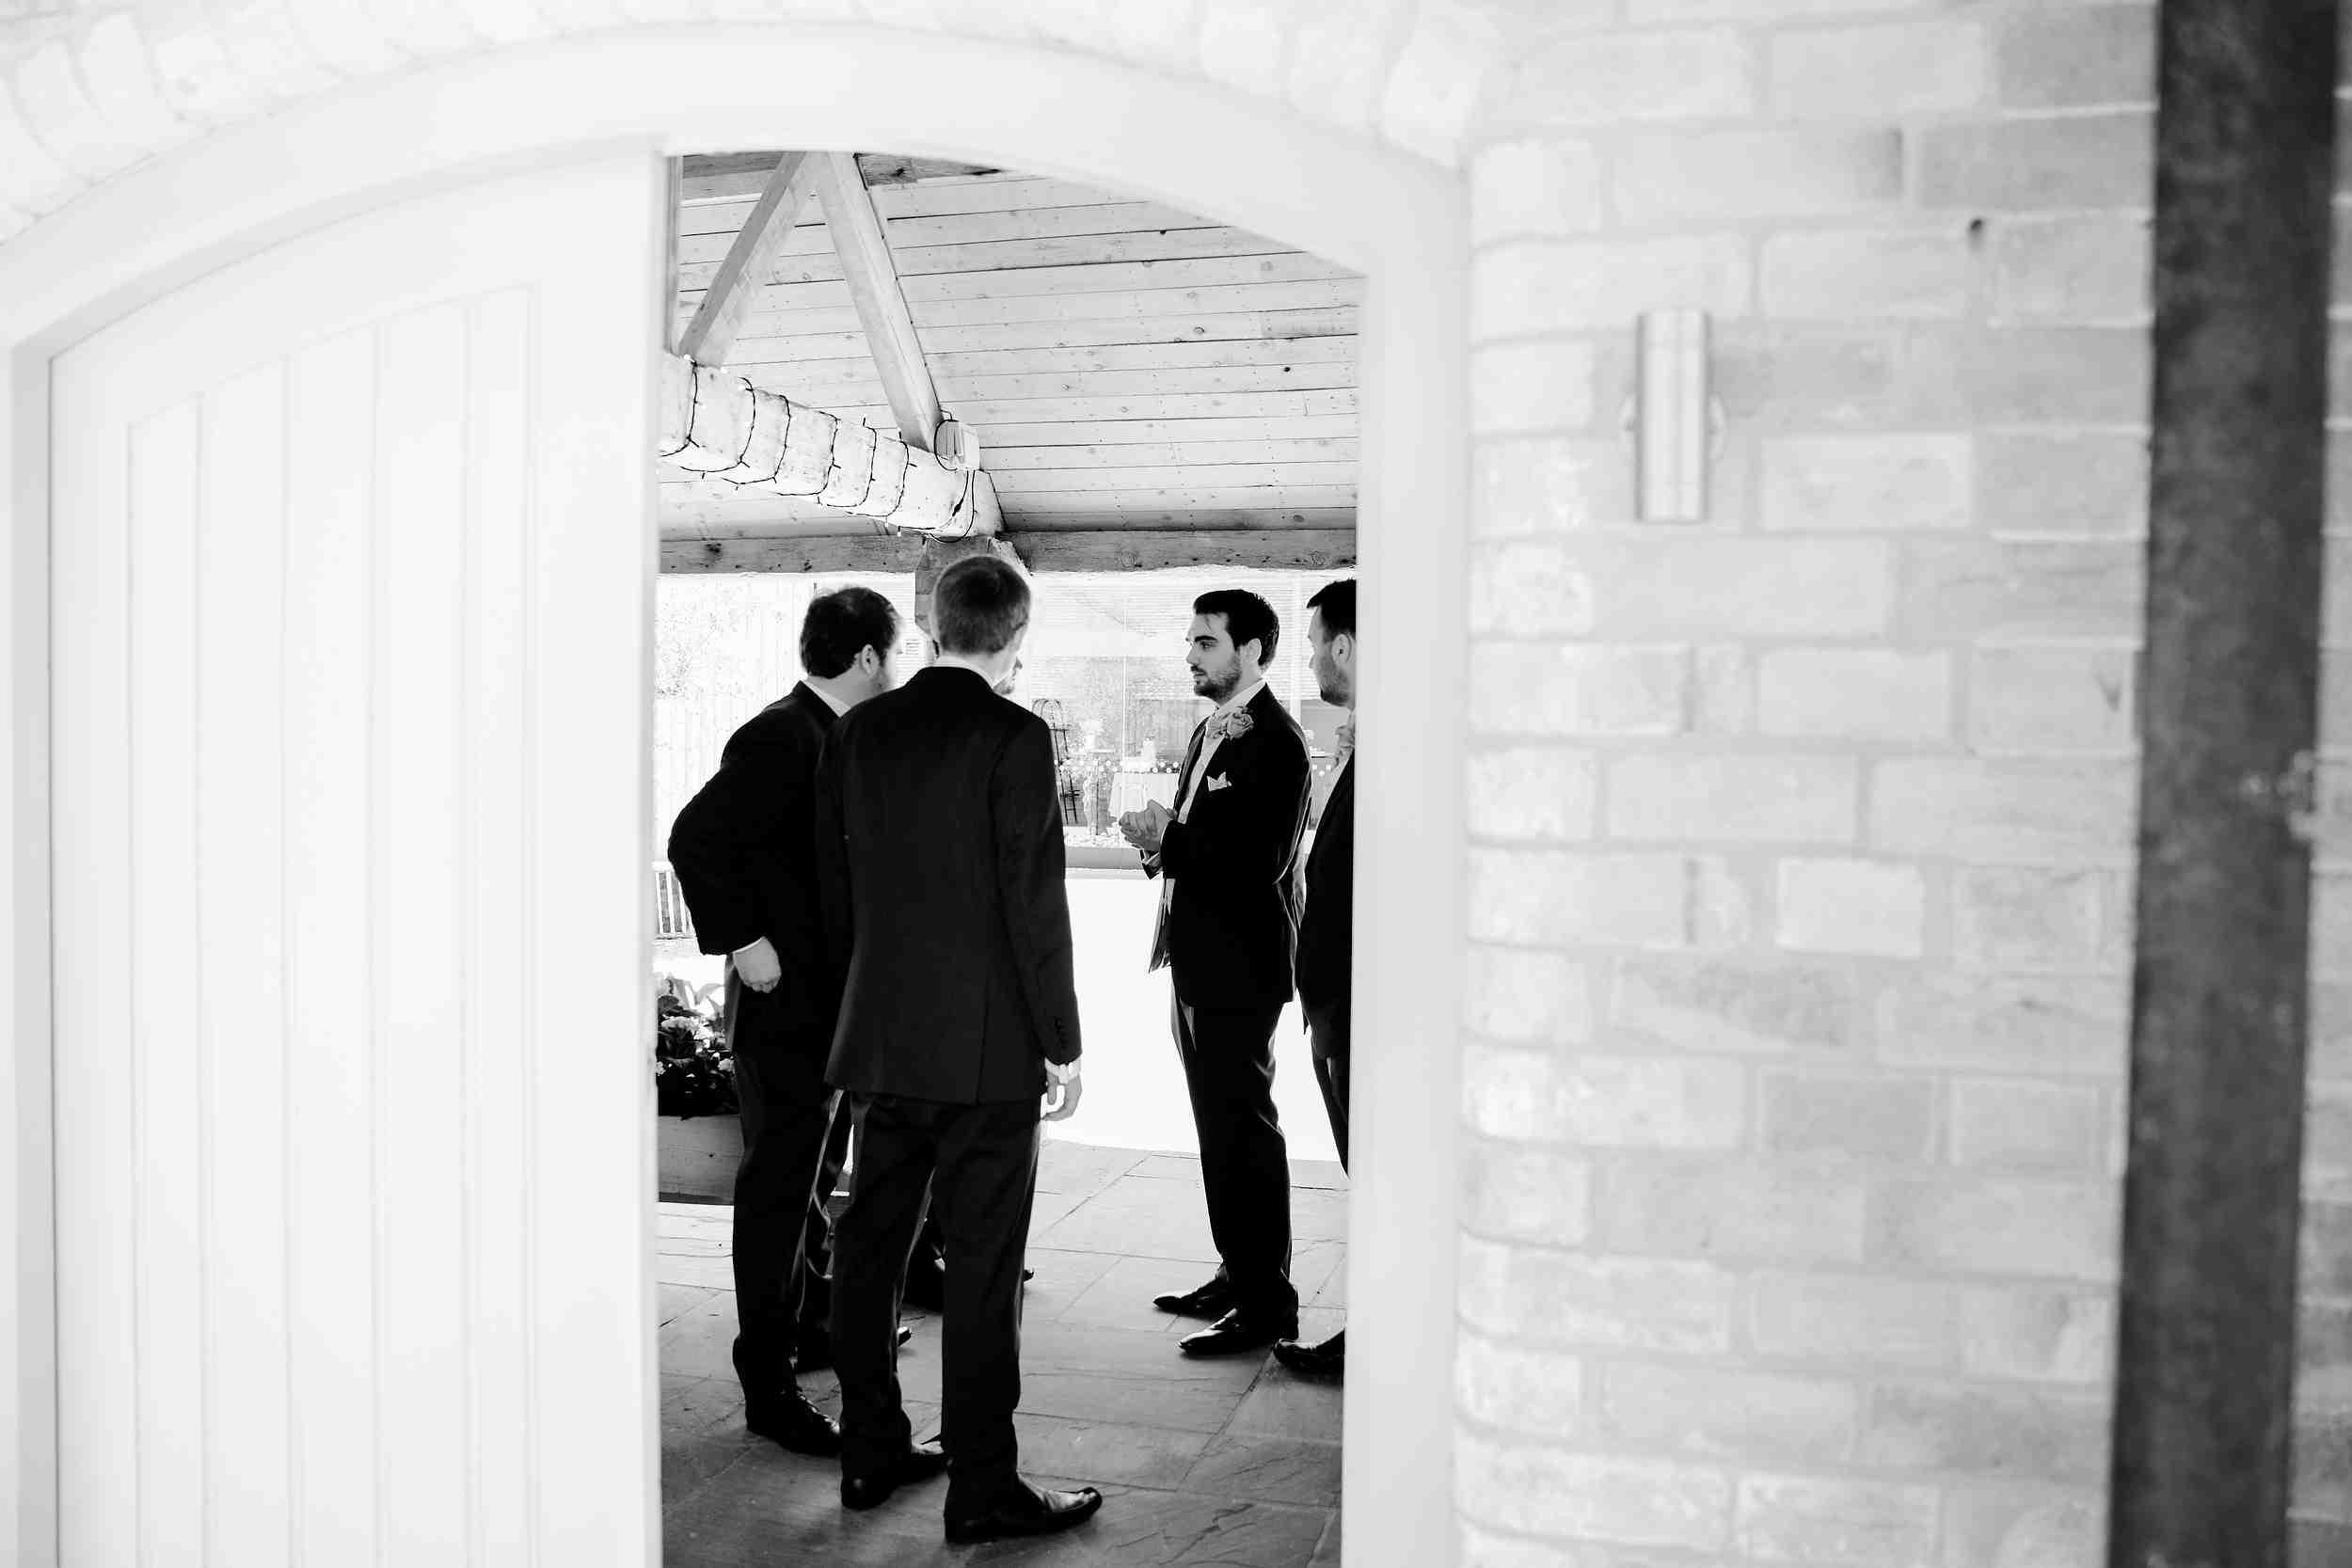 groom and groomsmen talking through doorway documentary style photography